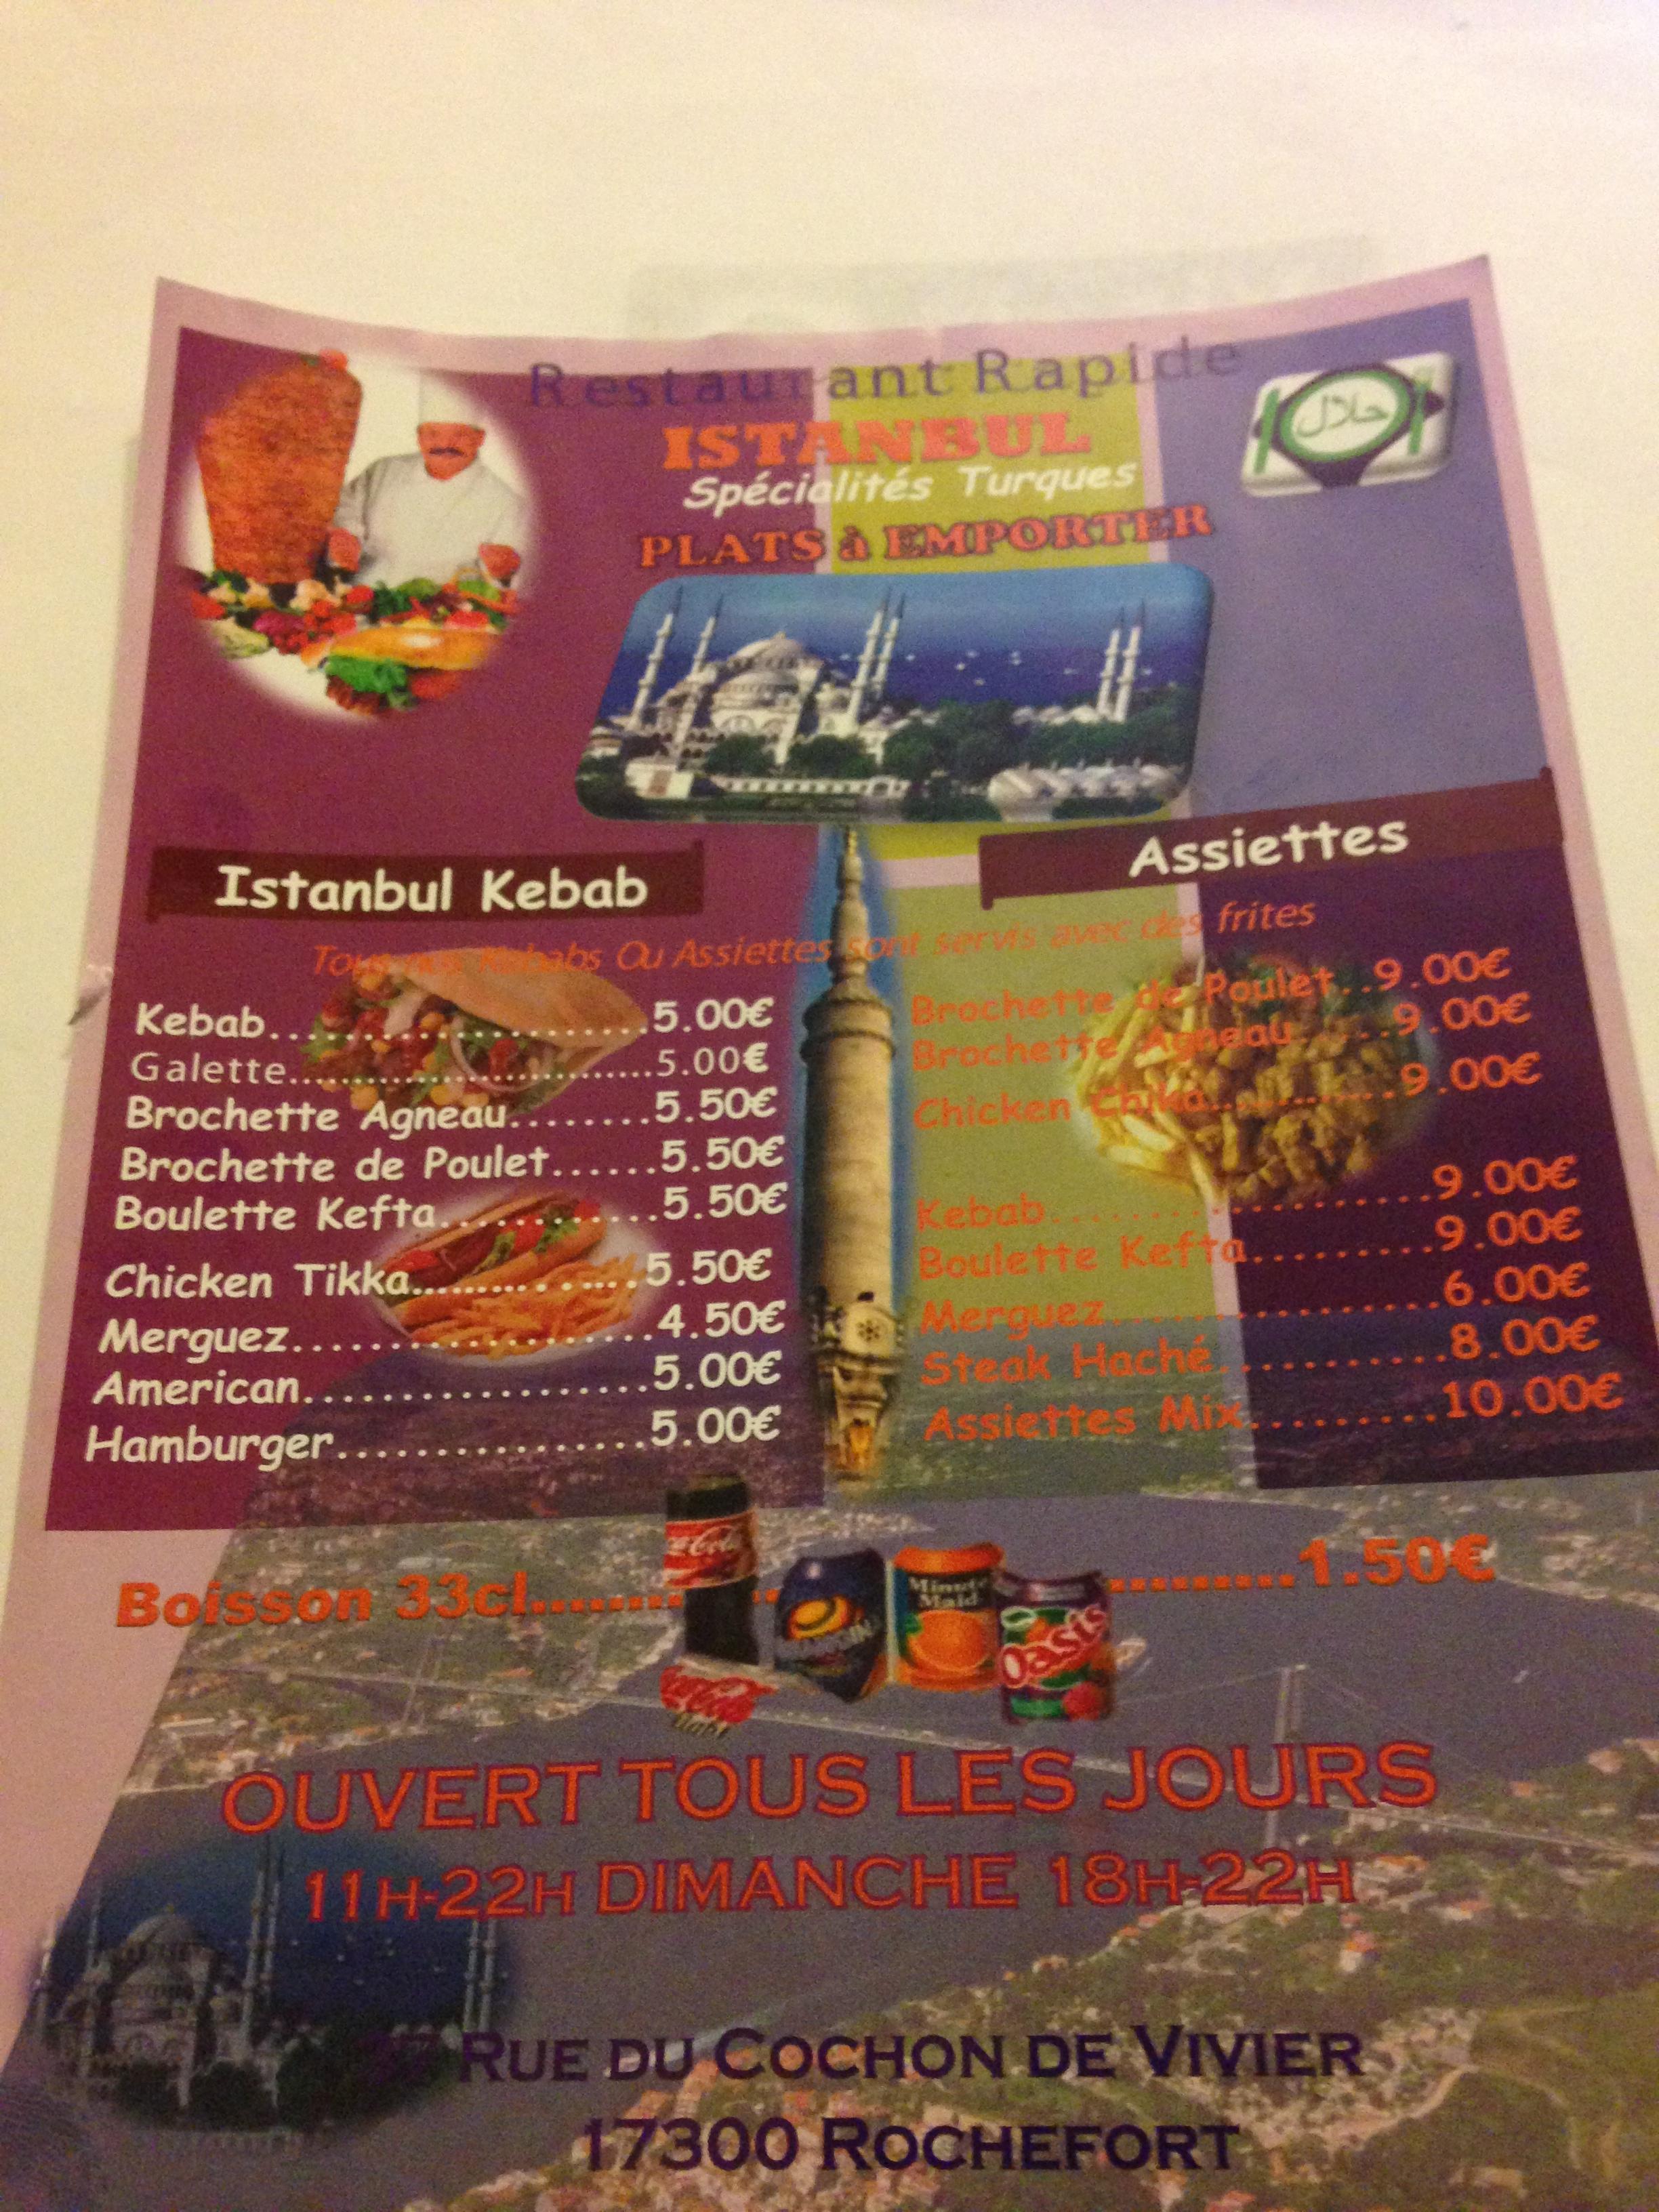 Istanbul Retaurant Rapide à Rochefort